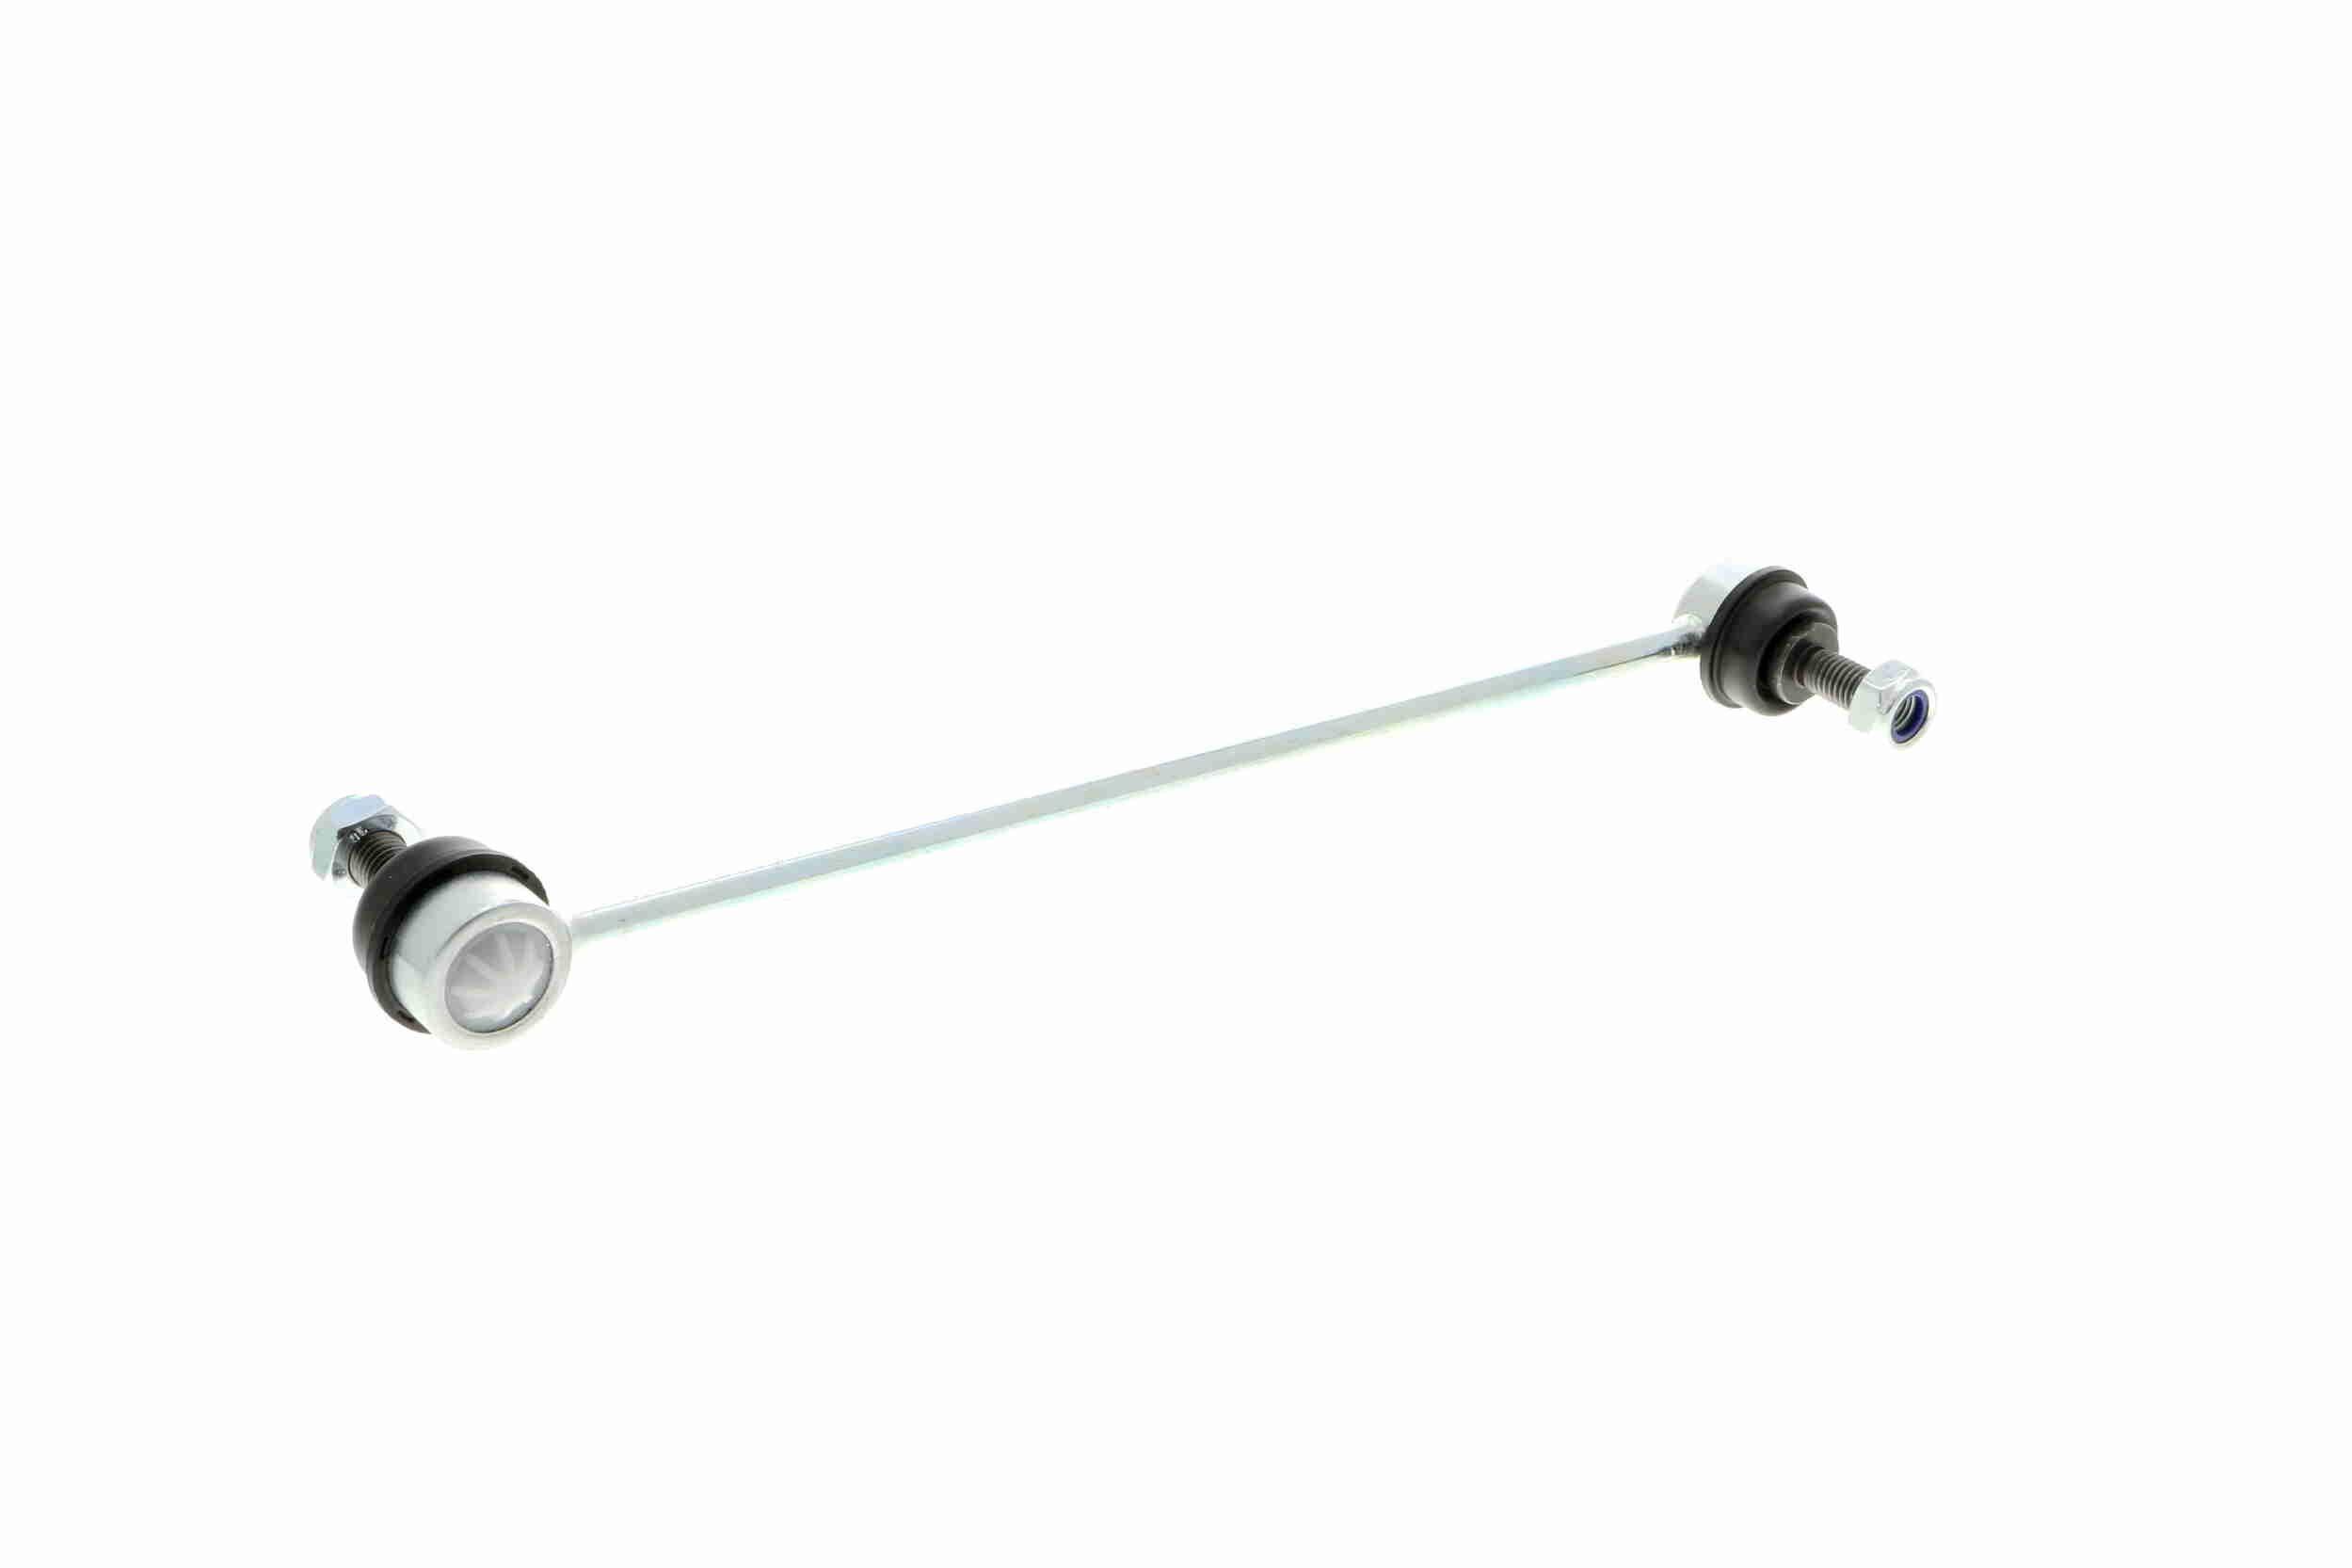 Buy original Anti roll bar stabiliser kit VAICO V20-7180